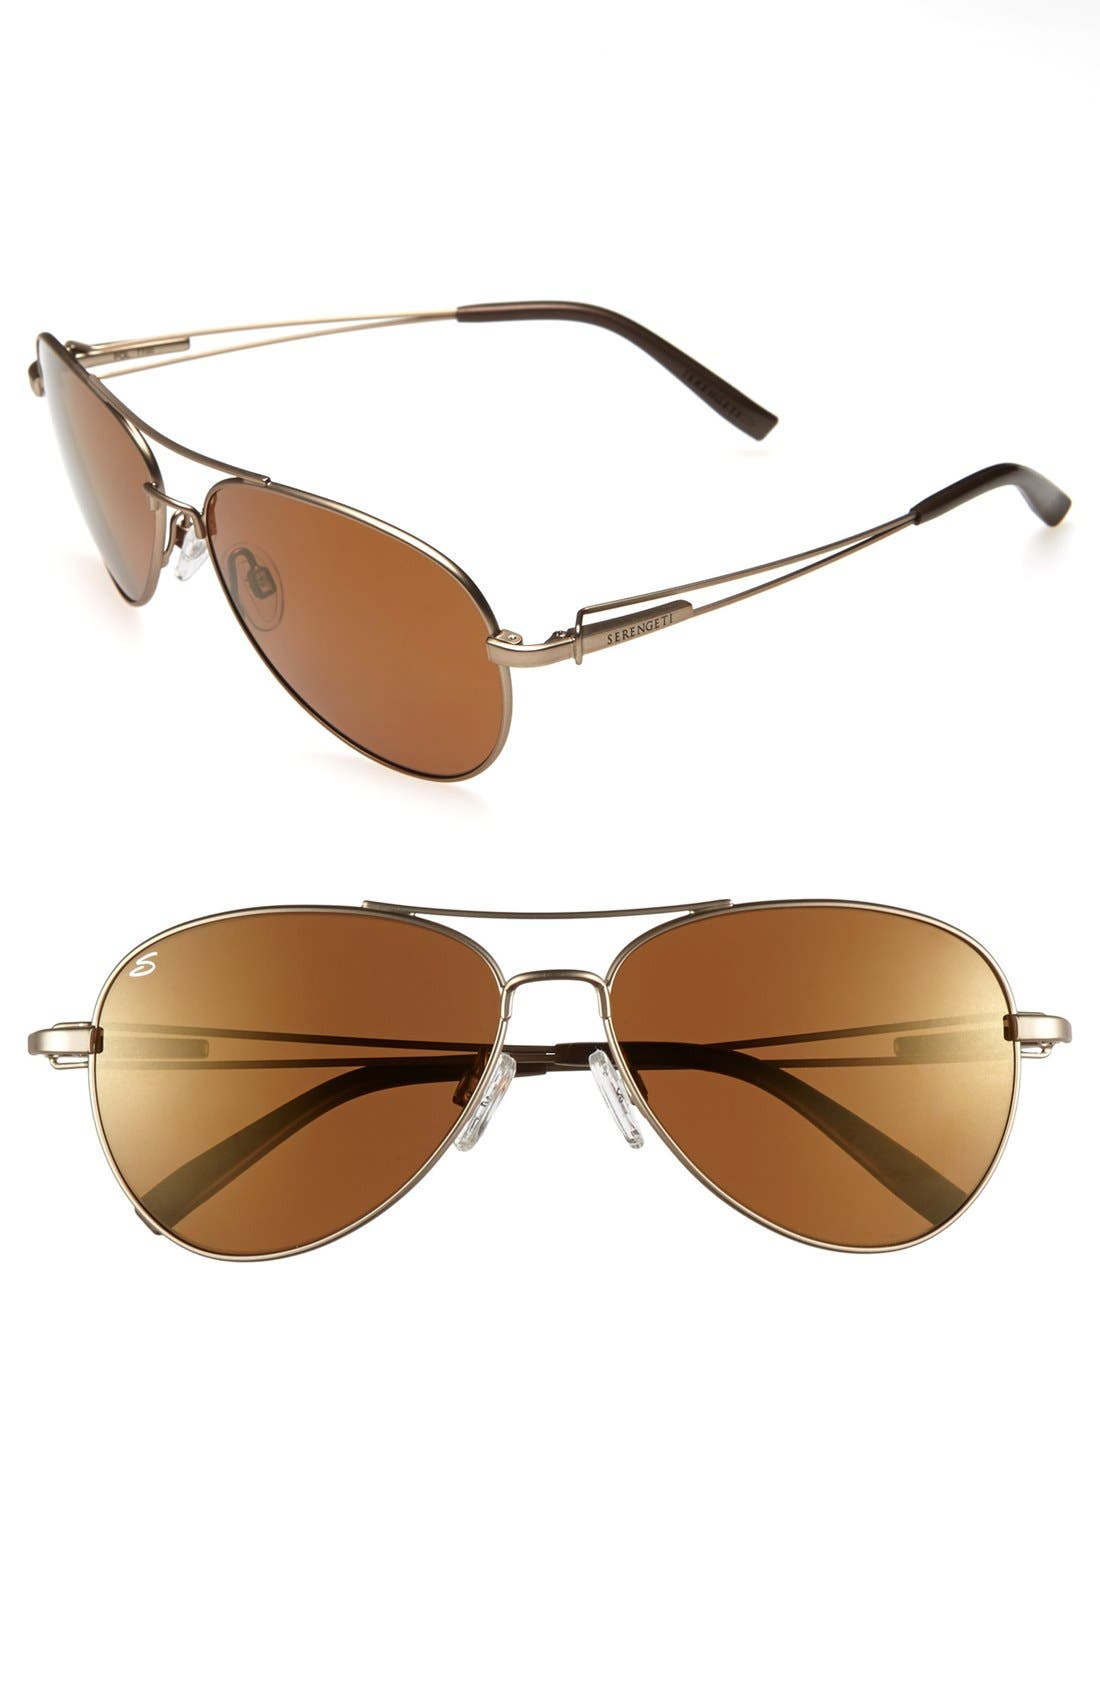 Alternate Image 1 Selected - Serengeti Polarized 60mm Aviator Sunglasses